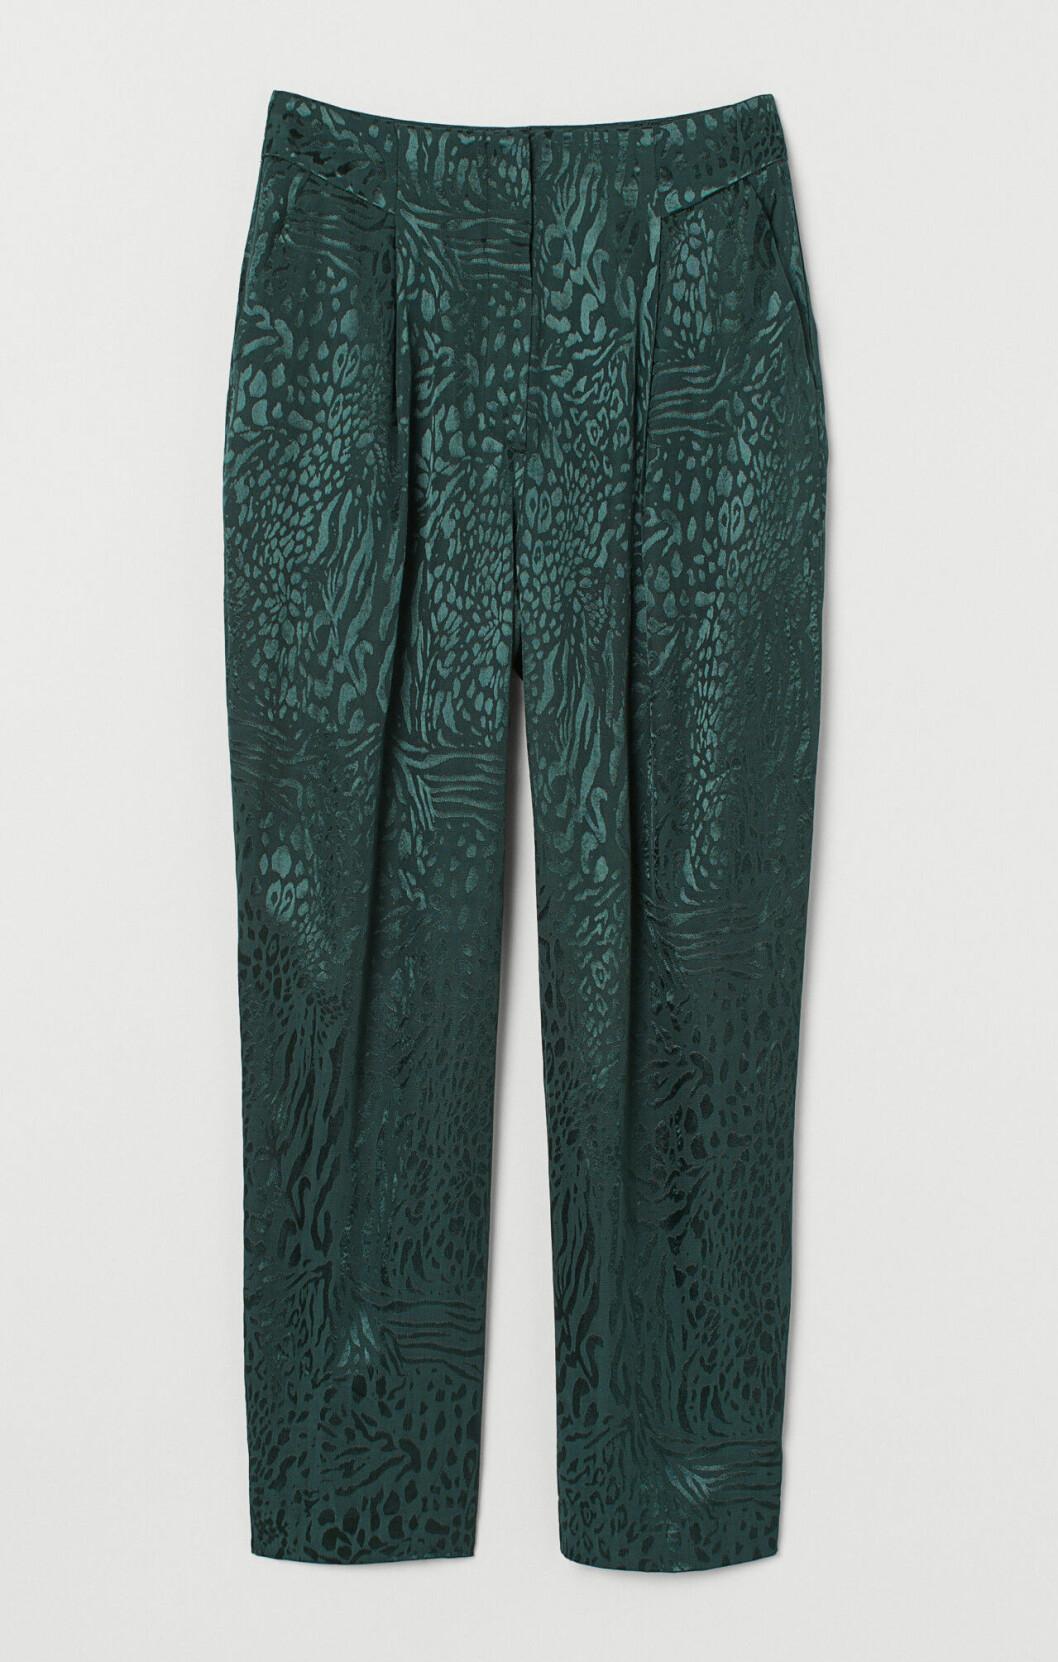 Matchande set: Gröna byxor från H&M